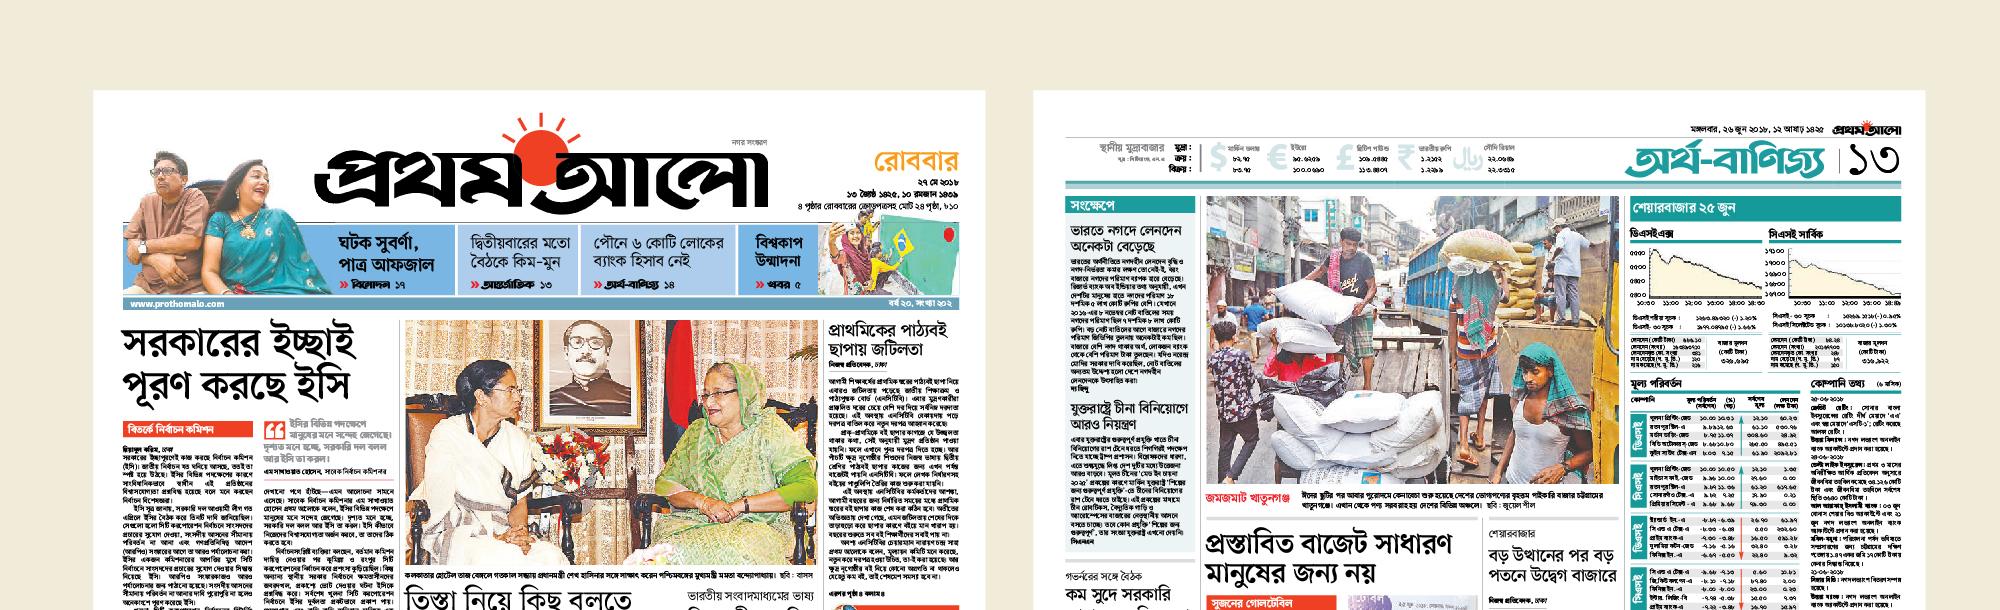 prothom alo bangla potrika